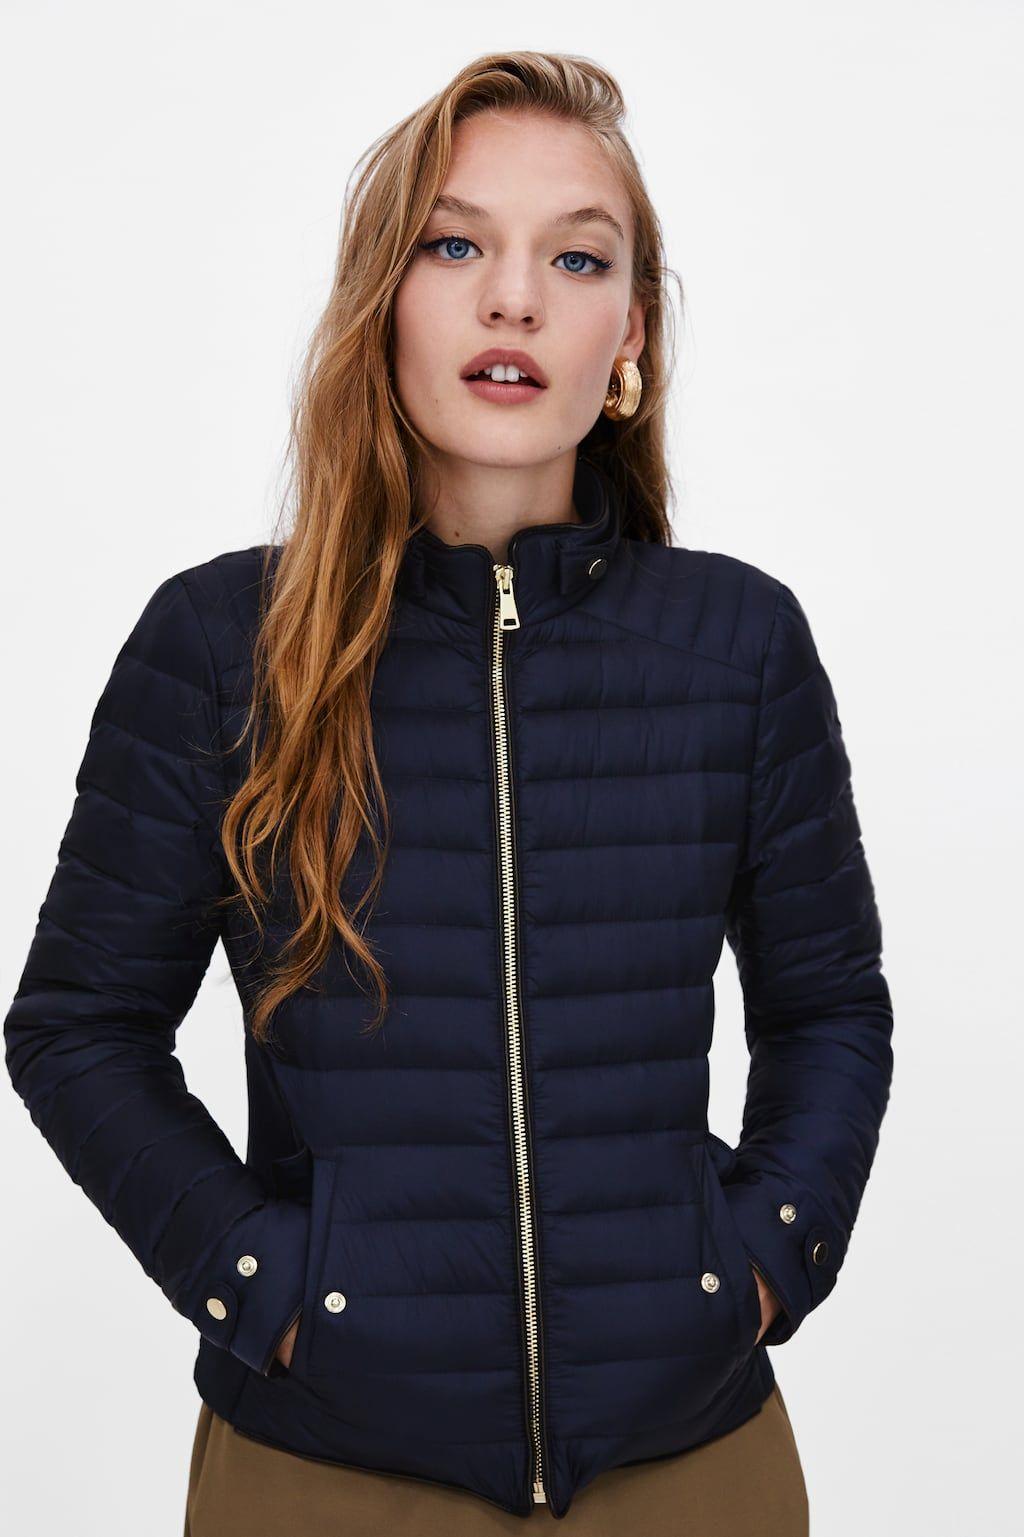 Image 4 Of Lightweight Down Puffer Jacket From Zara Puffer Jacket Women Blue Jackets Outfits Jackets Men Fashion [ 1537 x 1024 Pixel ]